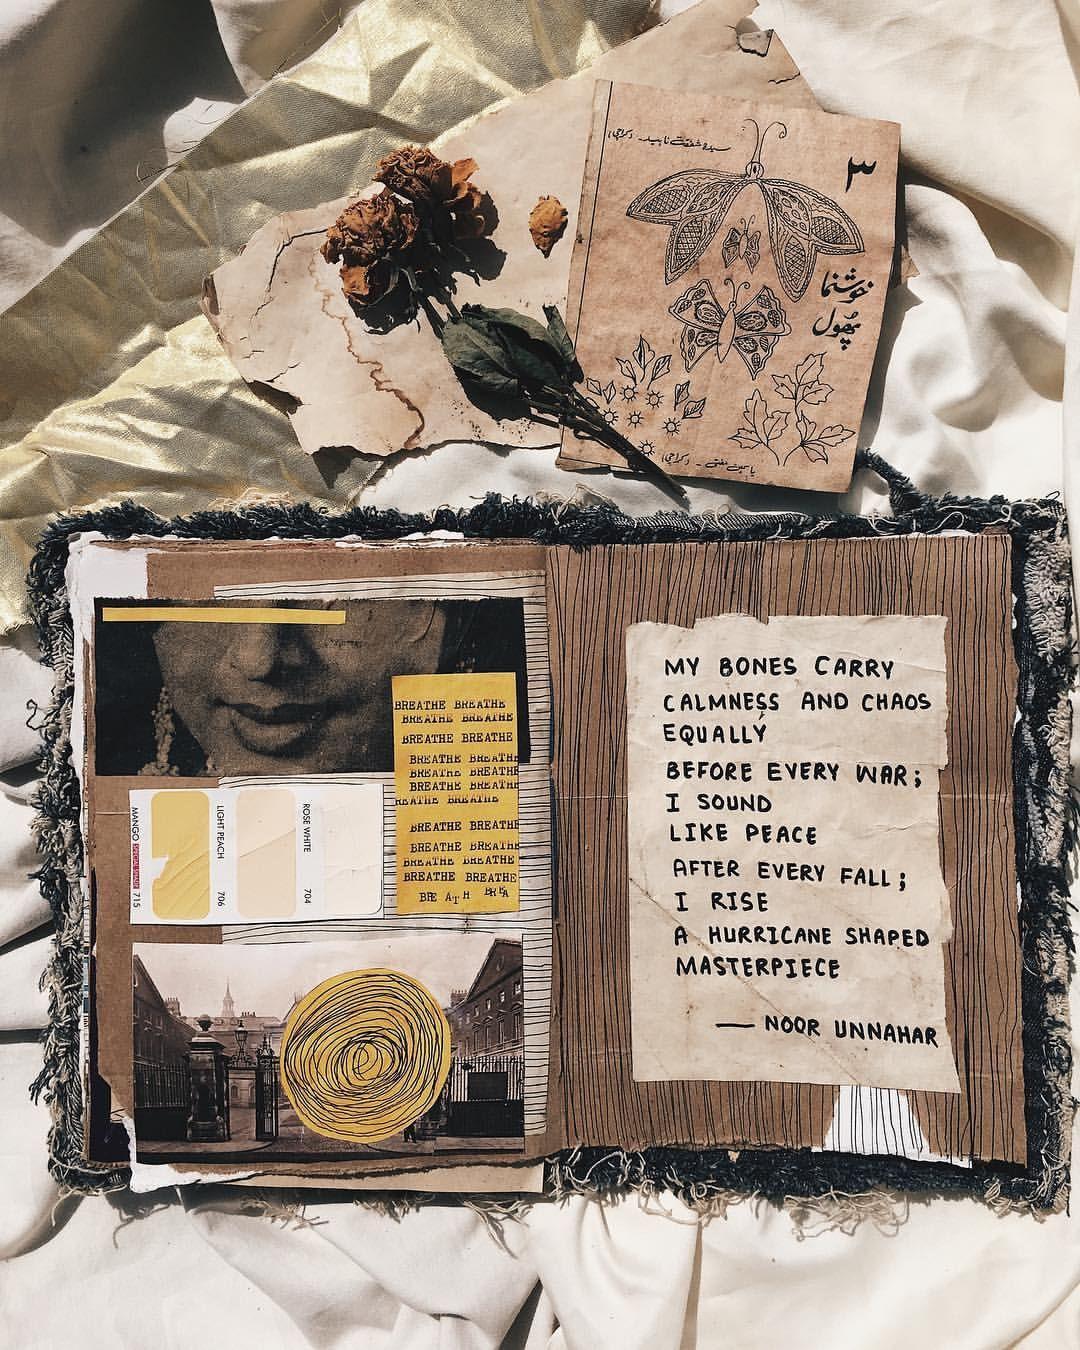 Hair Ideas Zeitschrift: A Hurricane Shaped Masterpiece // Poetry + Art Journal By